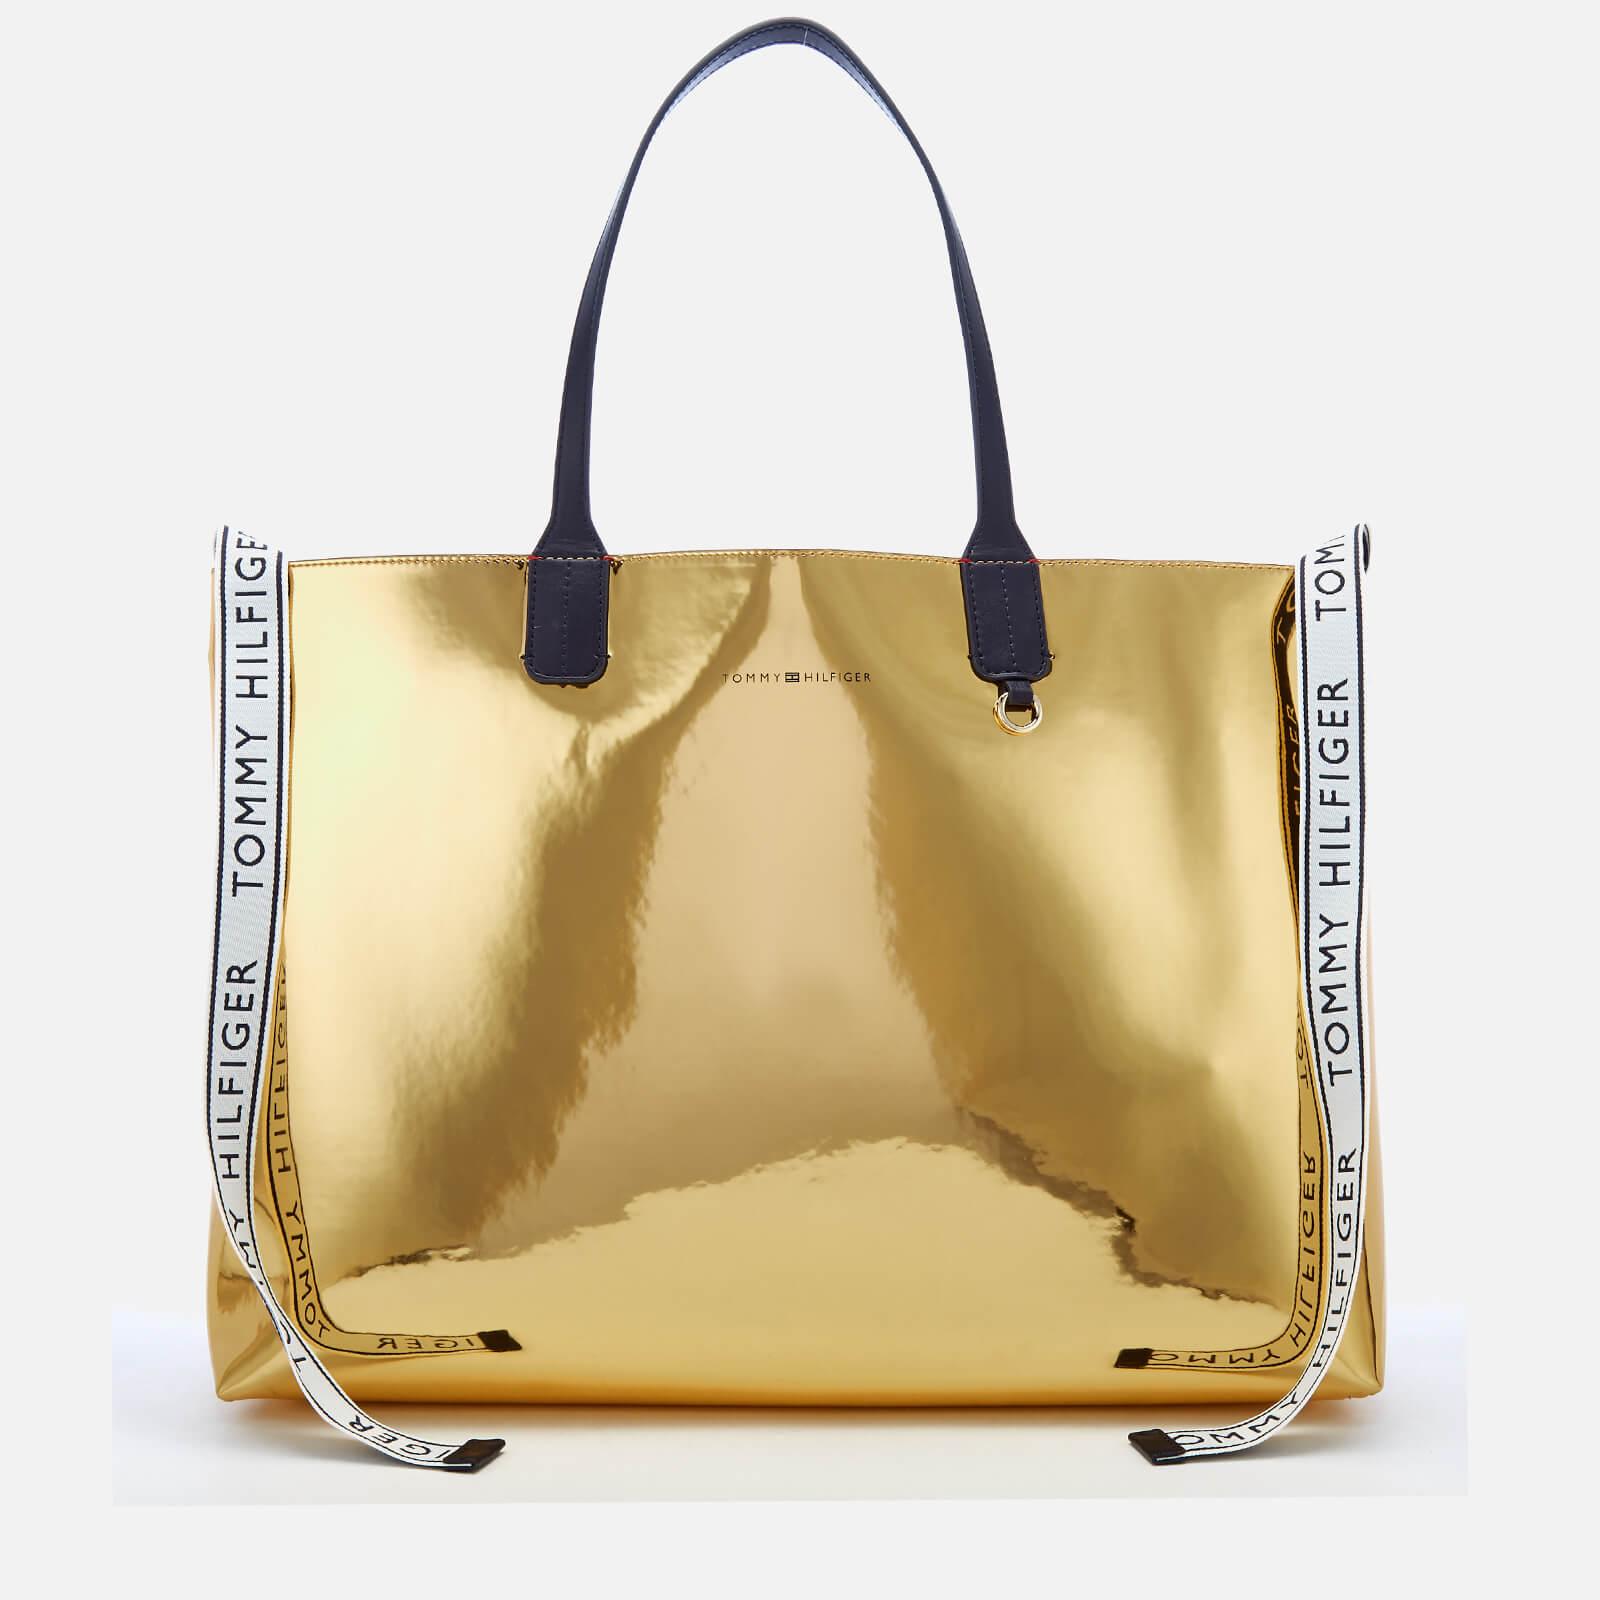 adadd6b0 Tommy Hilfiger Women's Iconic Tommy Tote Bag - Metallic Womens Accessories  | TheHut.com